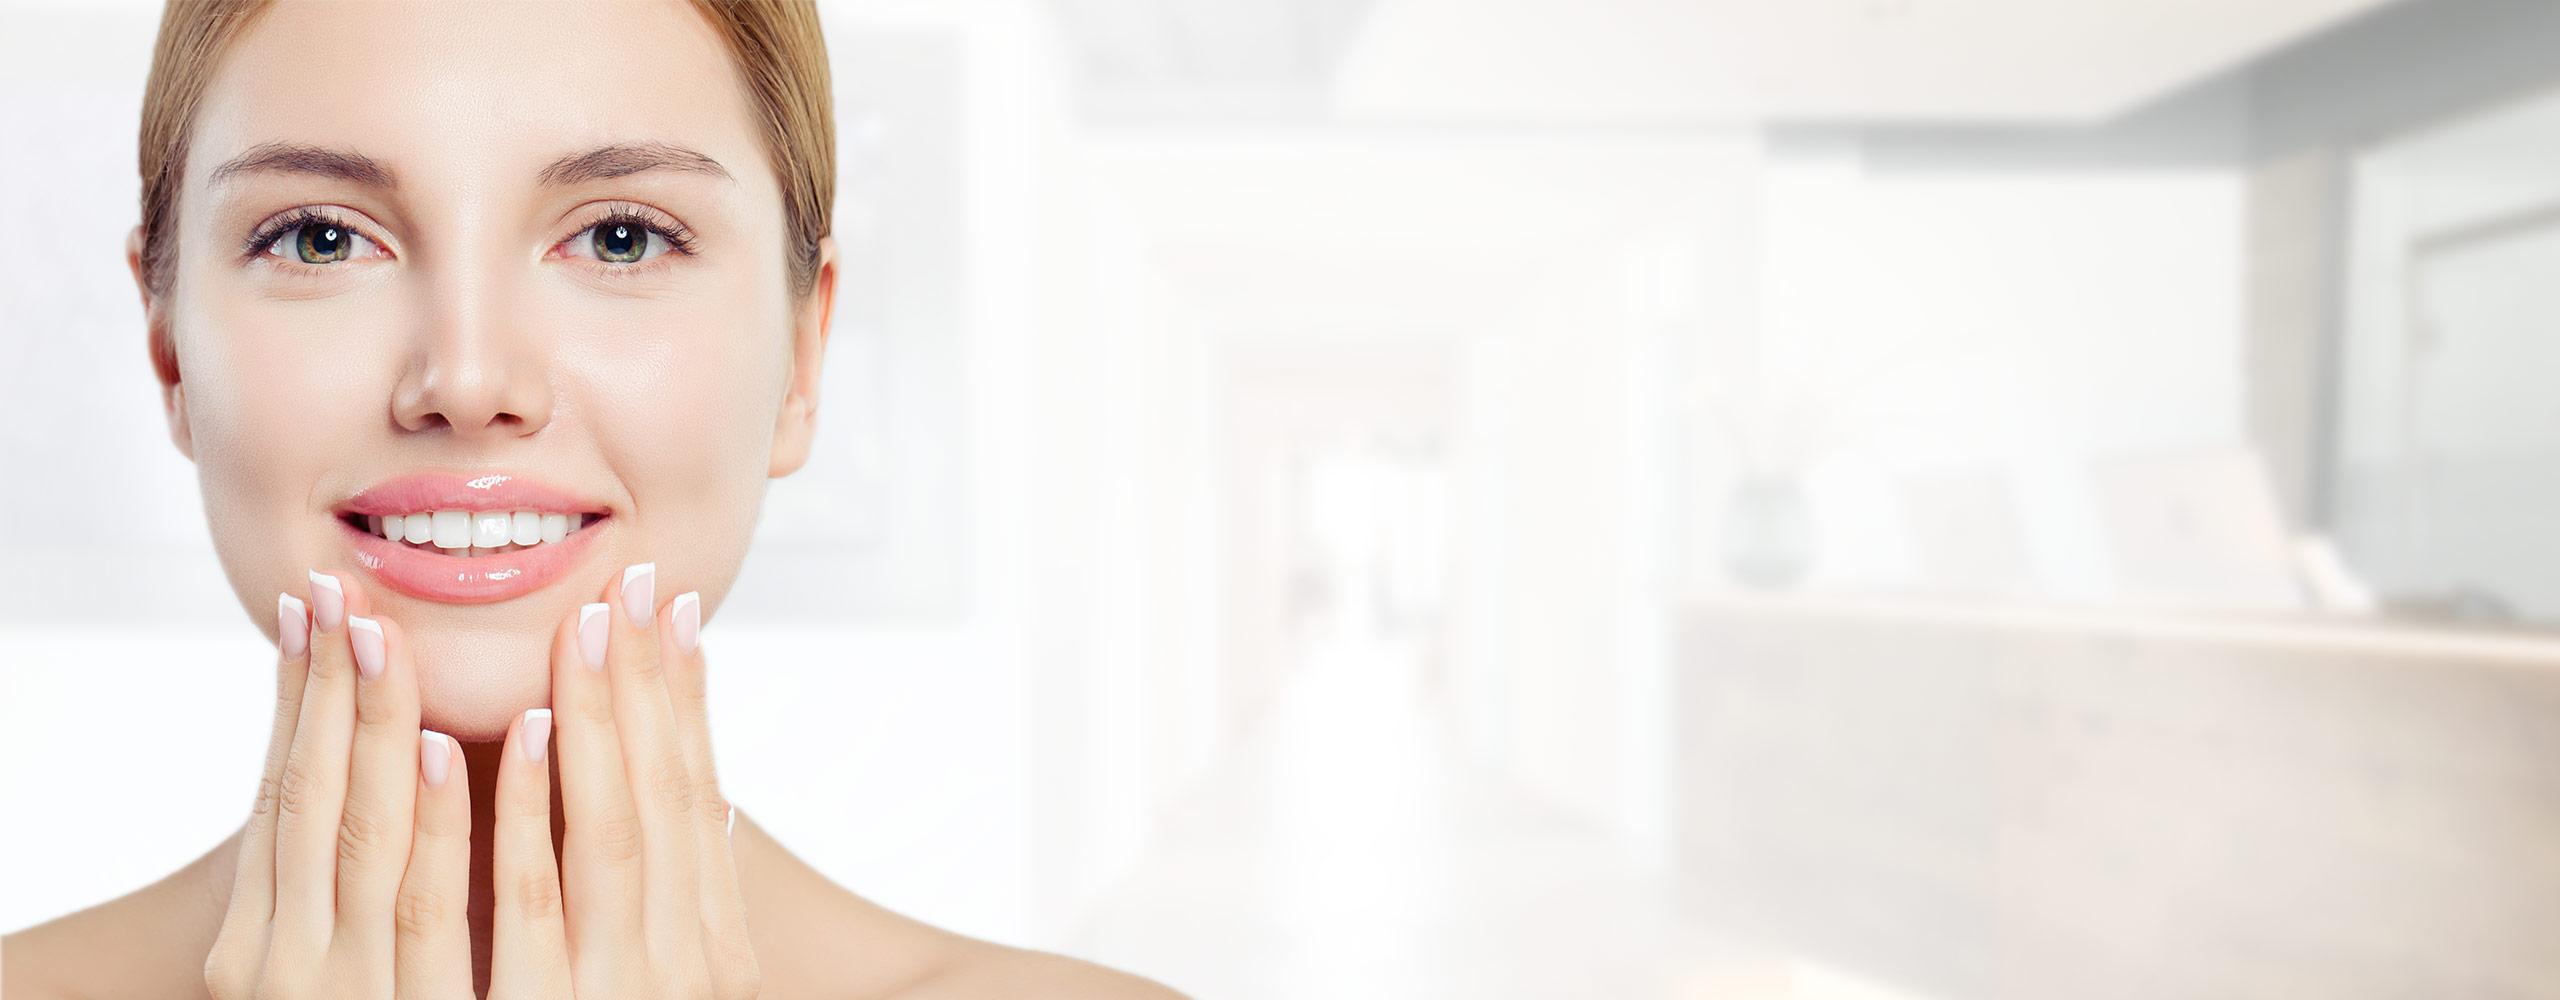 zahn zaehne bleaching veneers zahnimplantate proaesthetic header 2